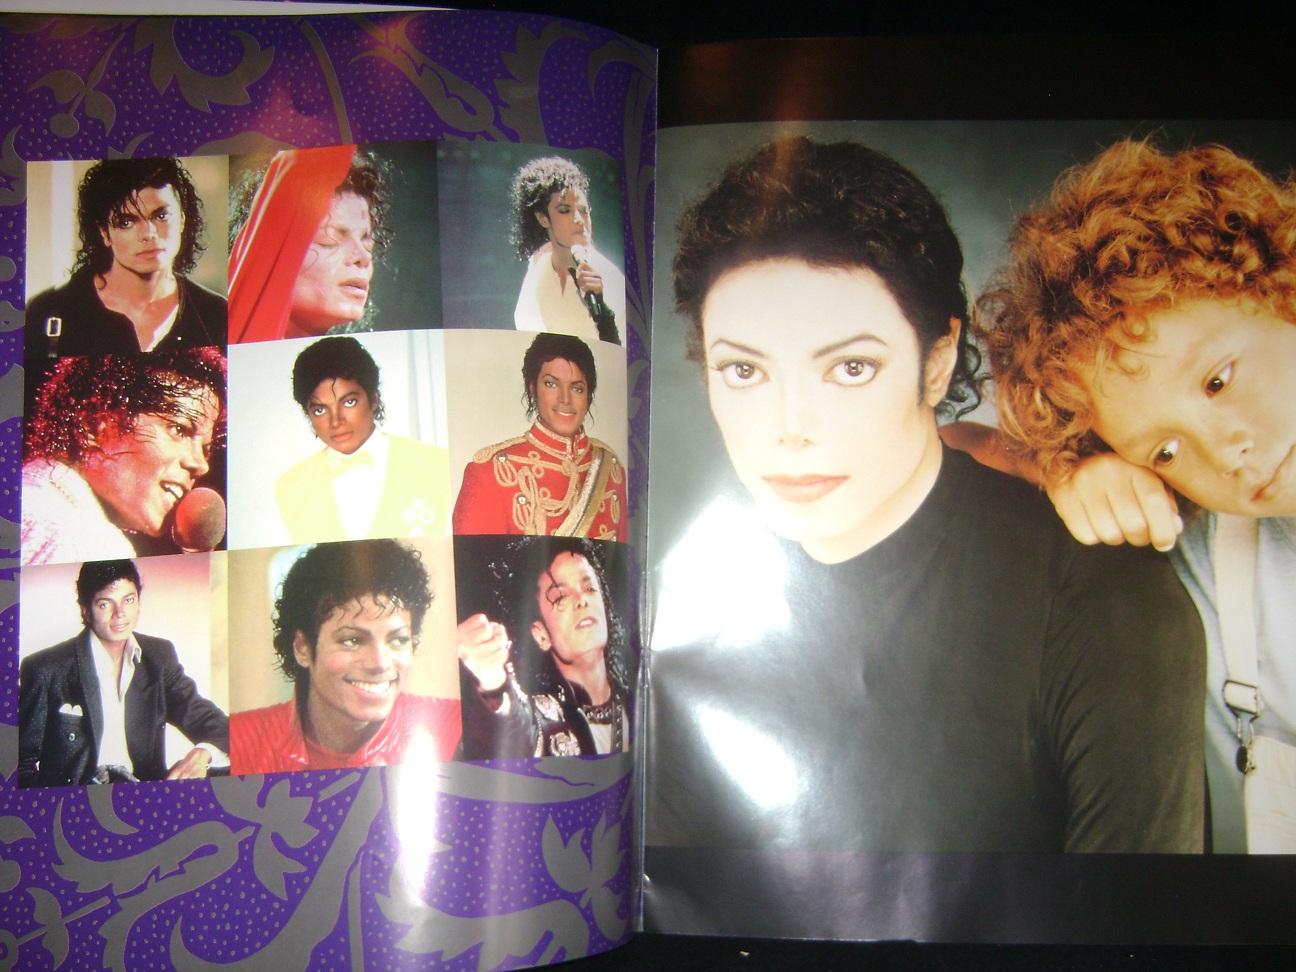 Michael_Jackson_King_of_pop_3.JPG